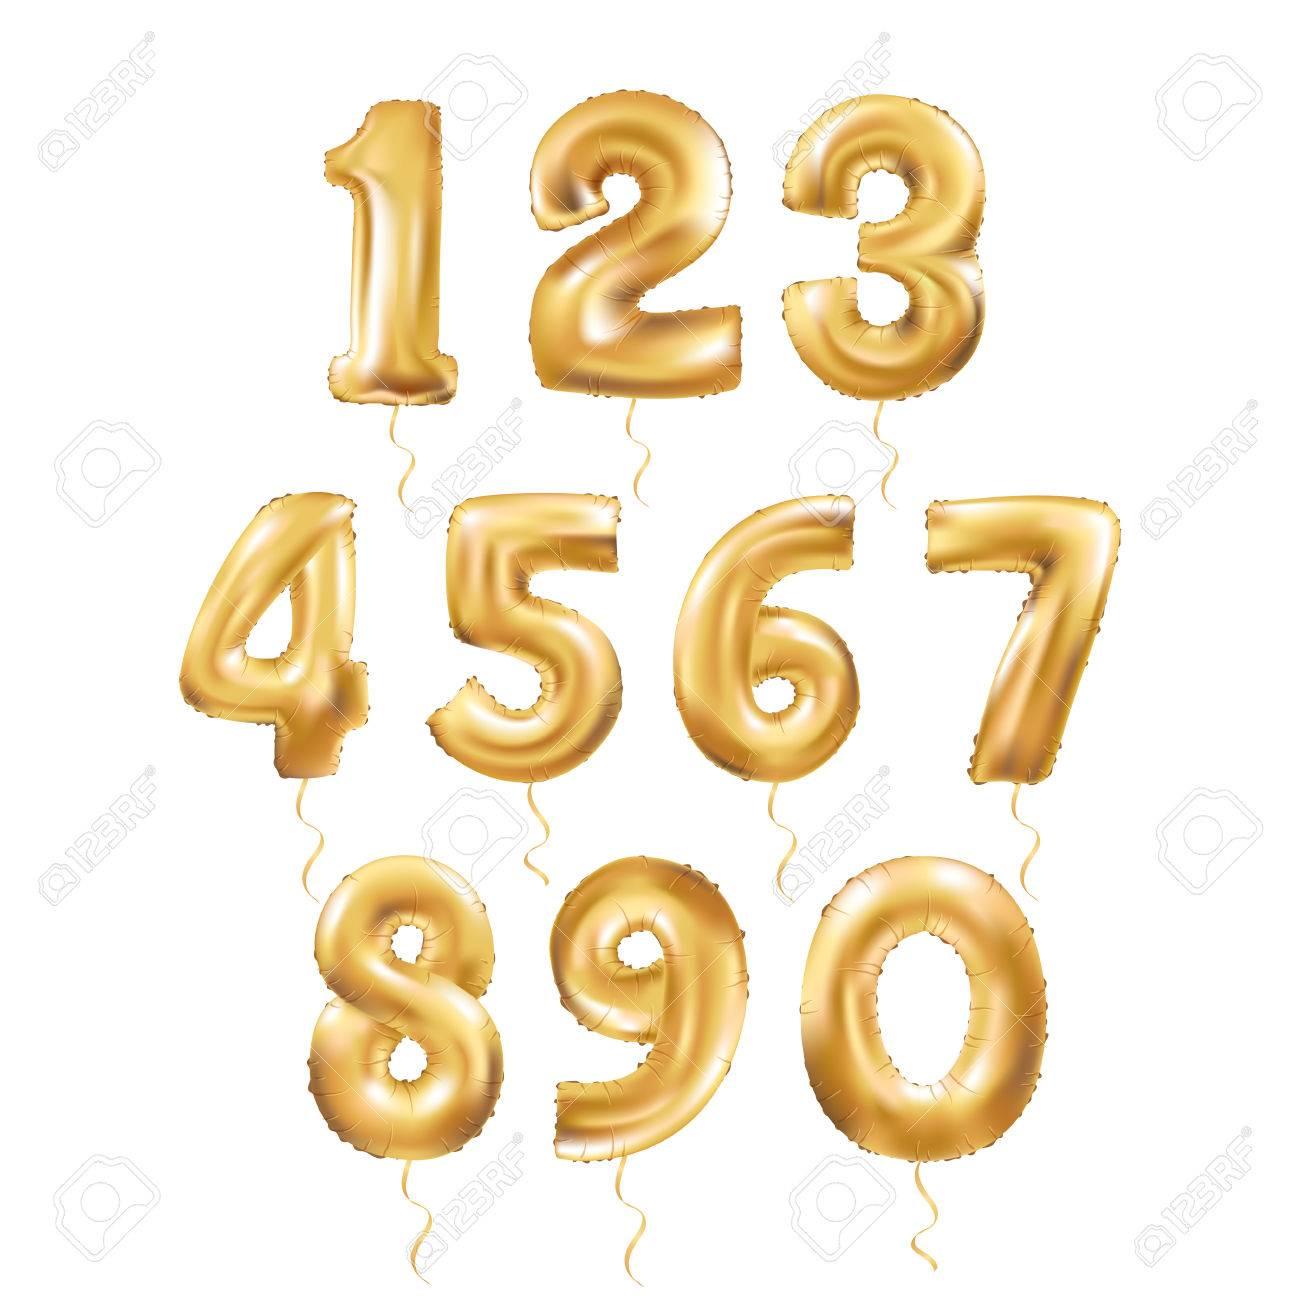 Metallic Gold Letter Balloons, 123 golden numeral alphabeth. Gold Number Balloons, 1, Alphabet Letter Balloons, 2, Number Balloons, 3 Air Filled Balloon - 67581288